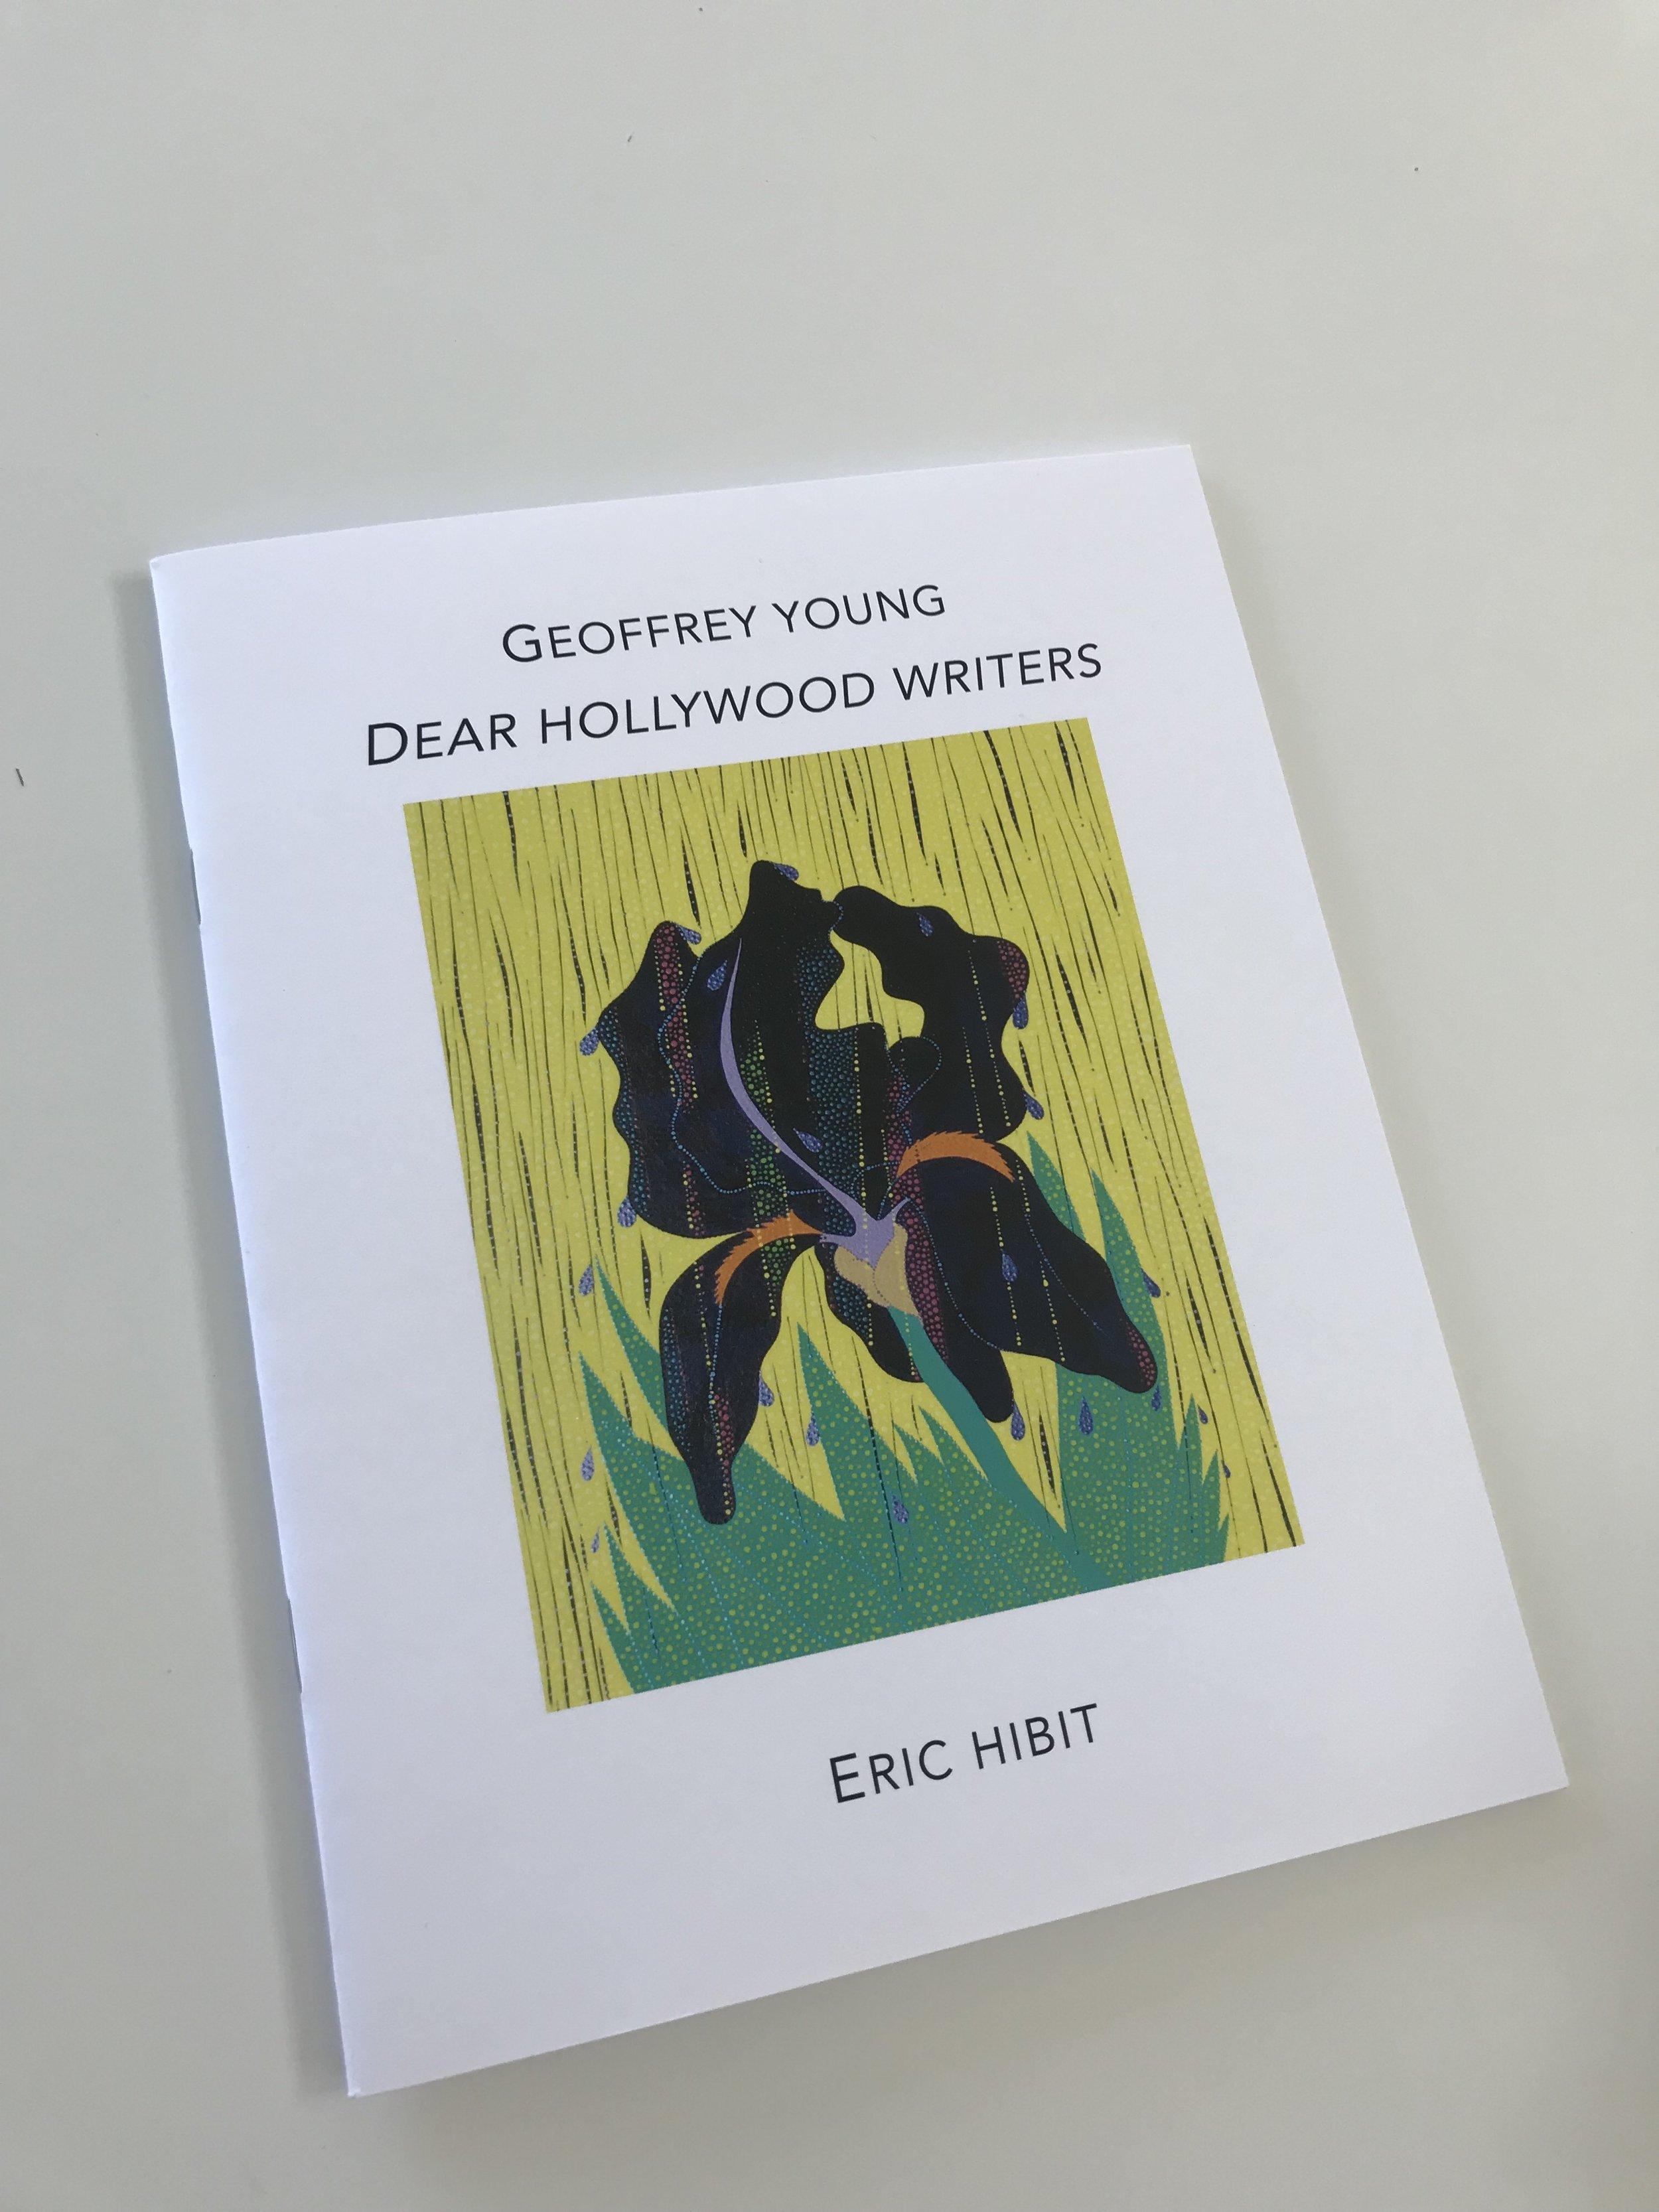 A Book of Art by Eric Hibit